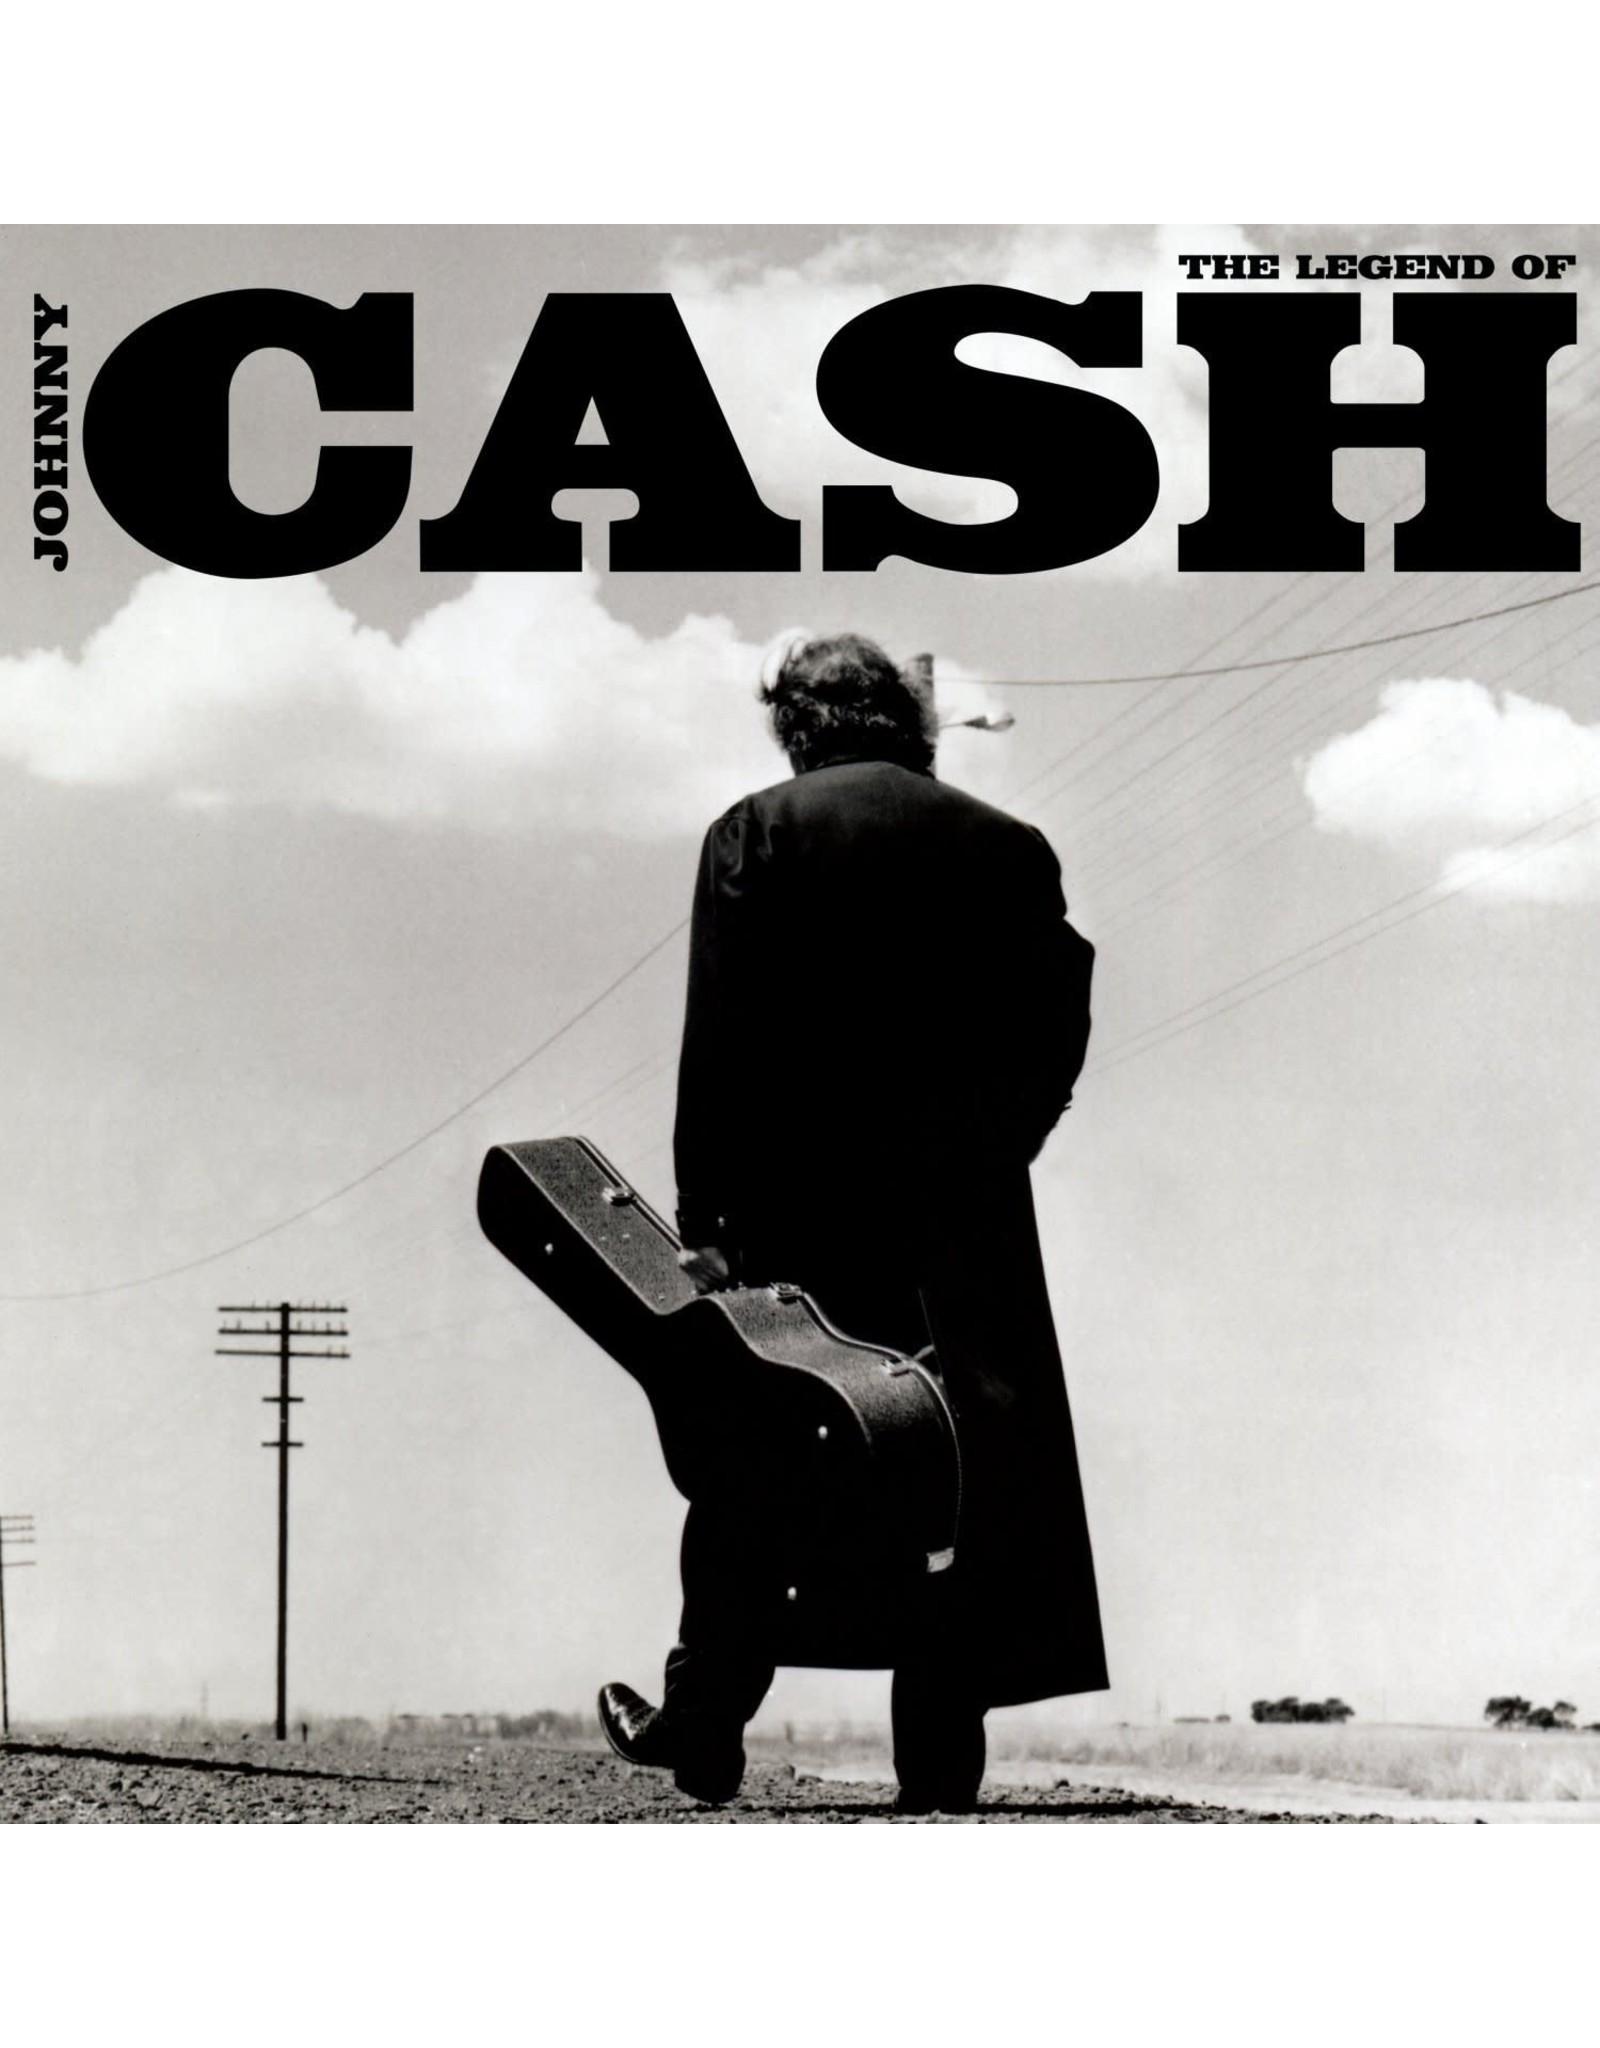 Johnny Cash - Legend of Johnny Cash (Greatest Hits)